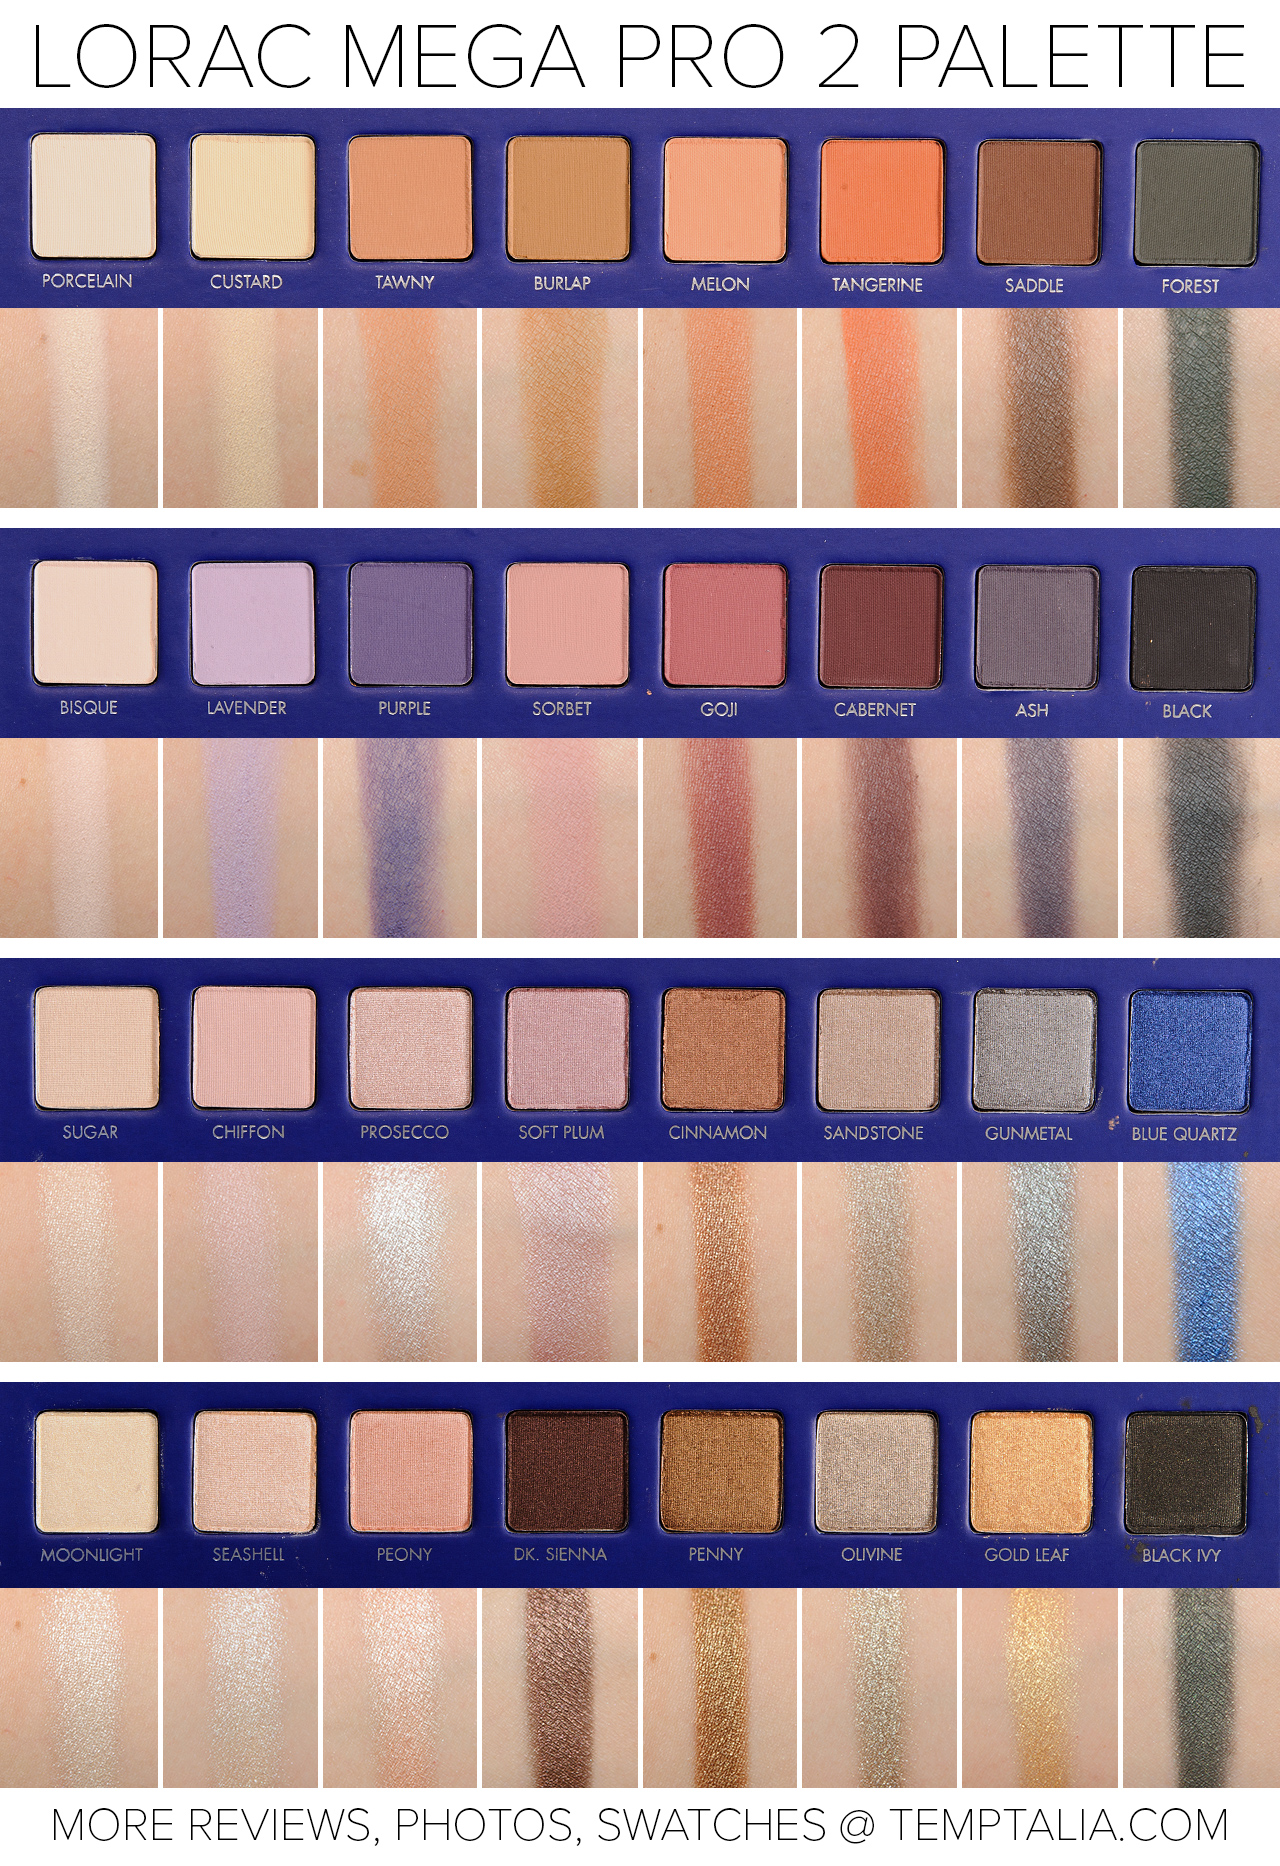 Sneak peek lorac mega pro 2 palette photos swatches baditri Gallery